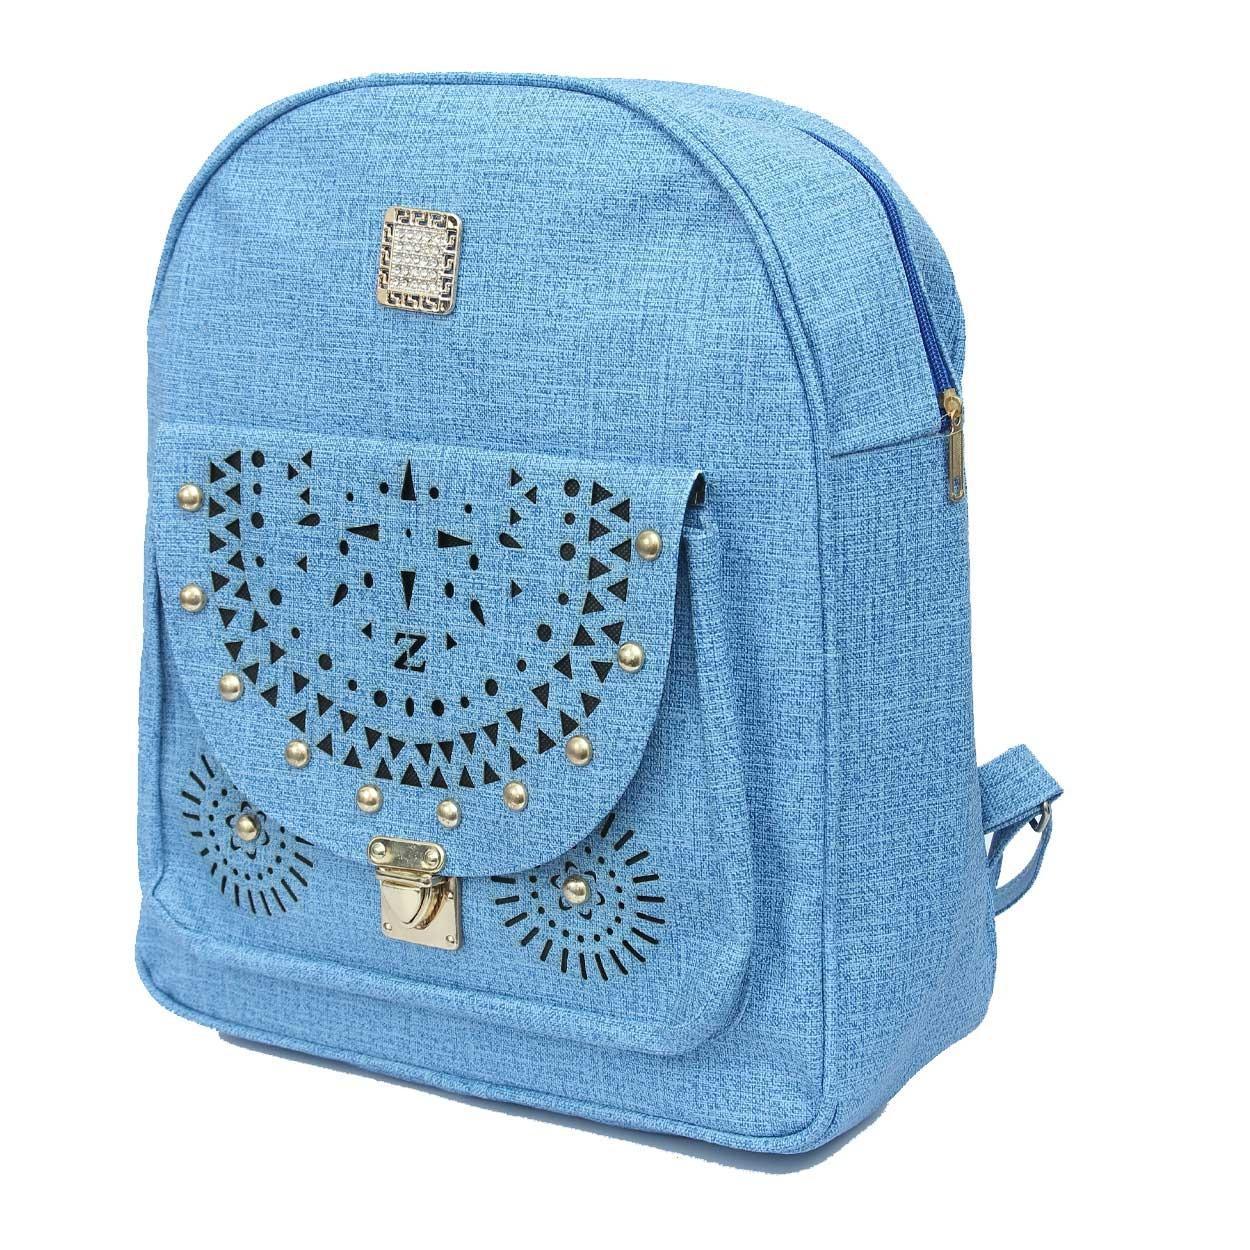 Fancy Stylish Multicolored Girls School Bag Girls College Bag Girls Backpack High School College Backpack For Girls Women Bag Ladies Bag